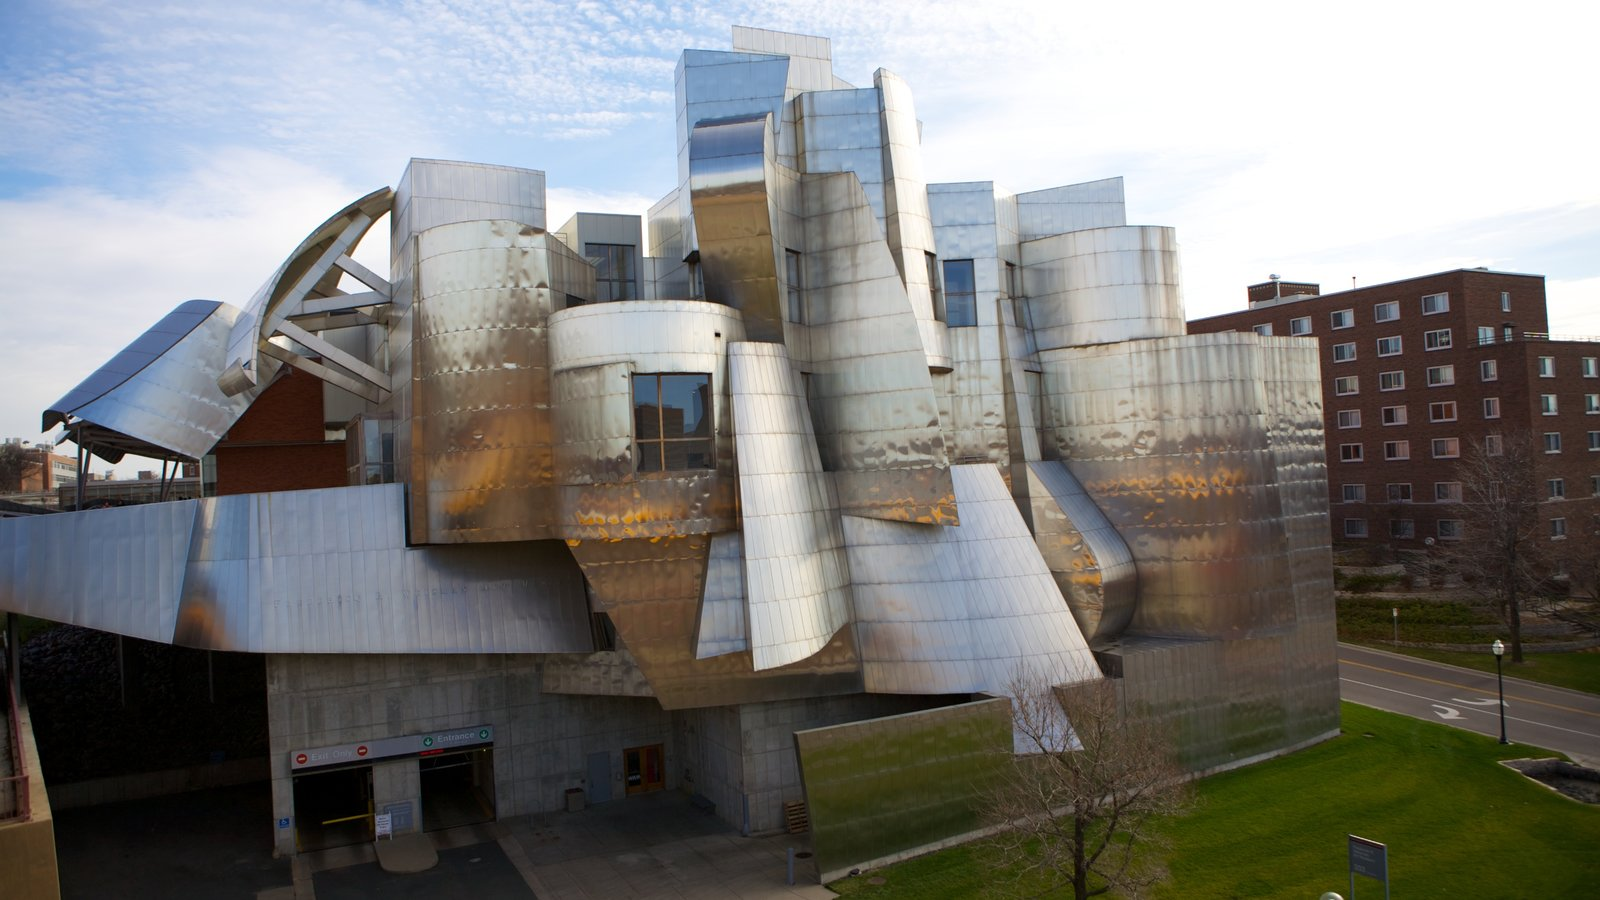 Weisman Art Museum caracterizando uma cidade